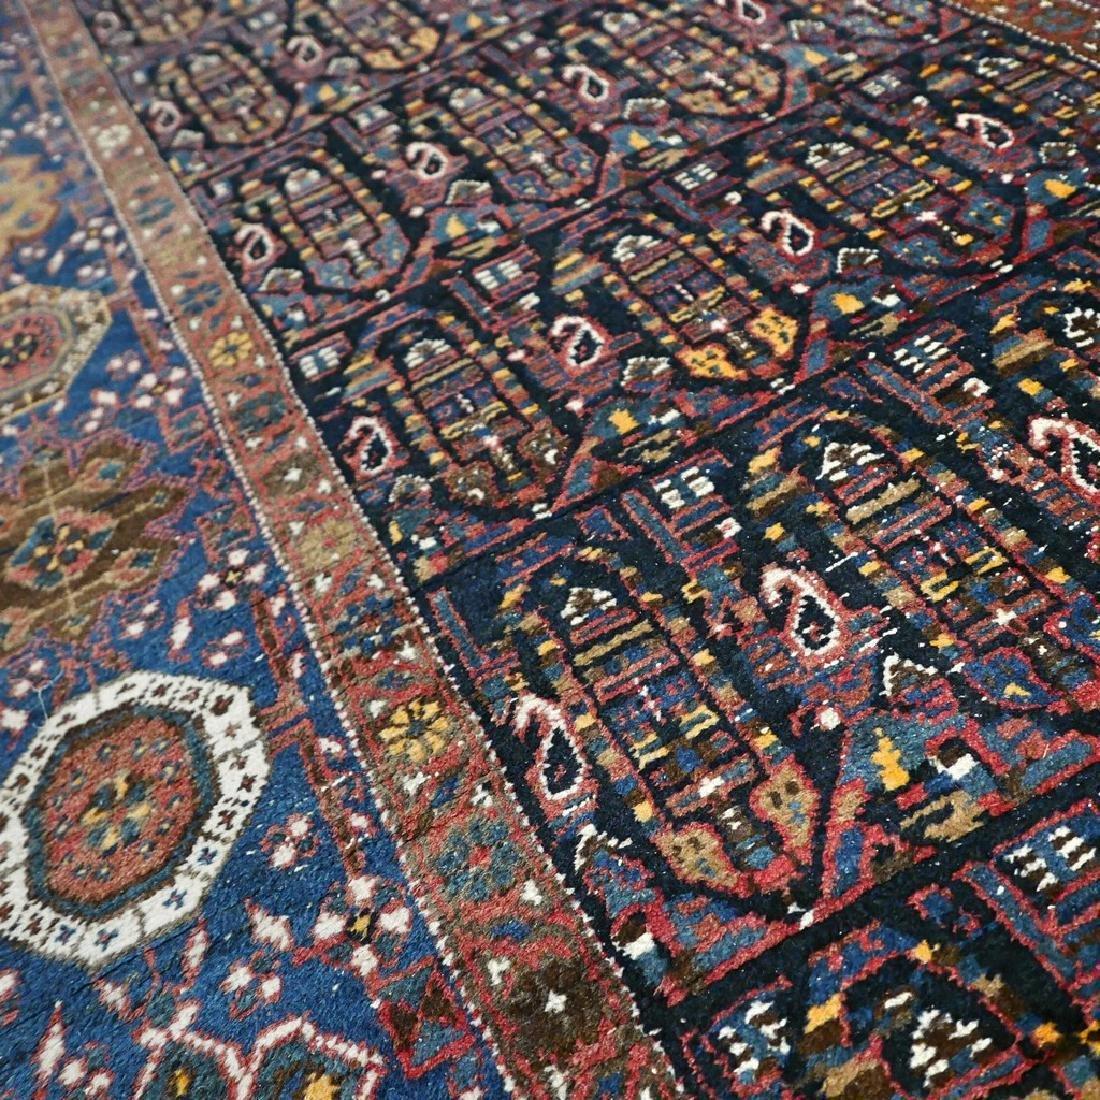 10.1x4.3 Antique Armenian boteh Kazak rug - 1880s - - 6